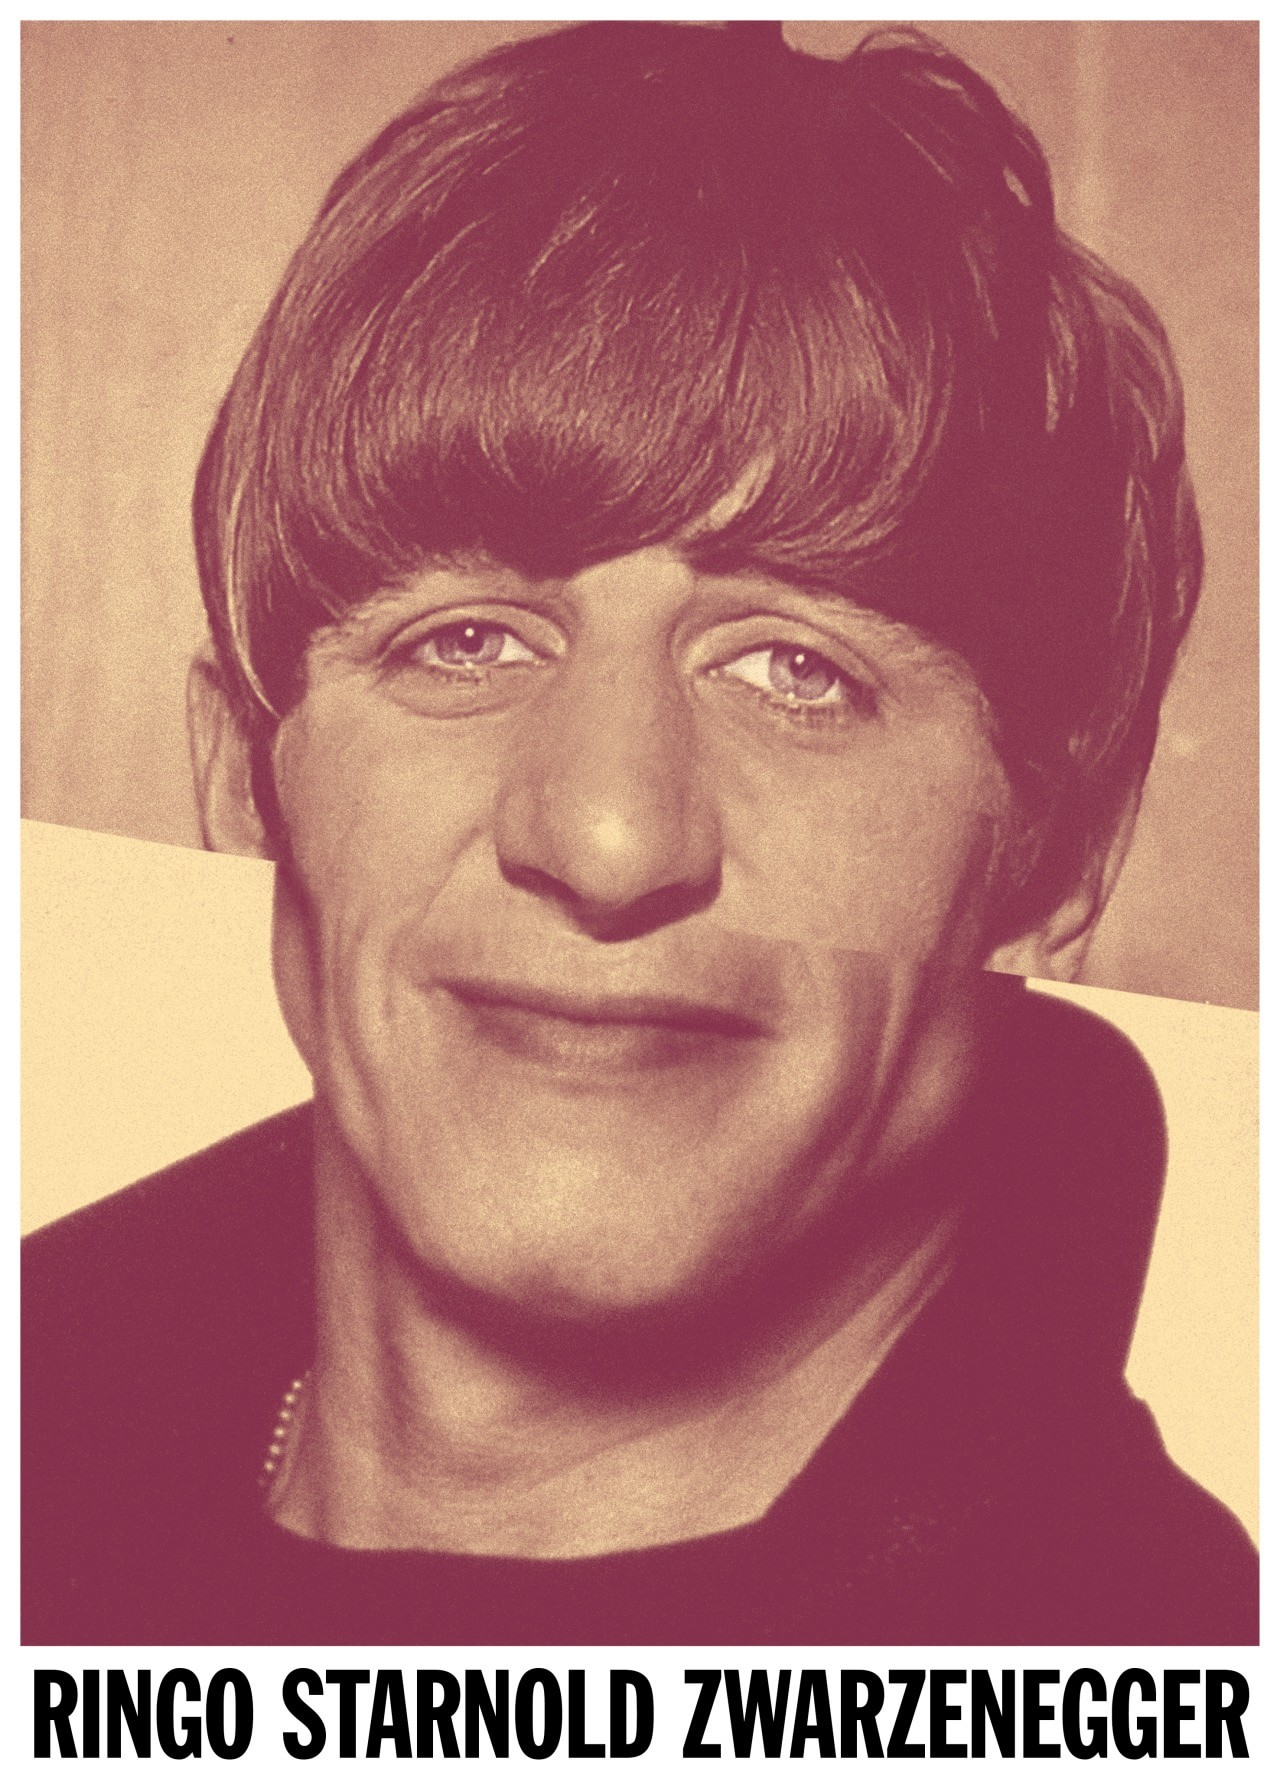 Ringo-starnold-schwarzenegger-min